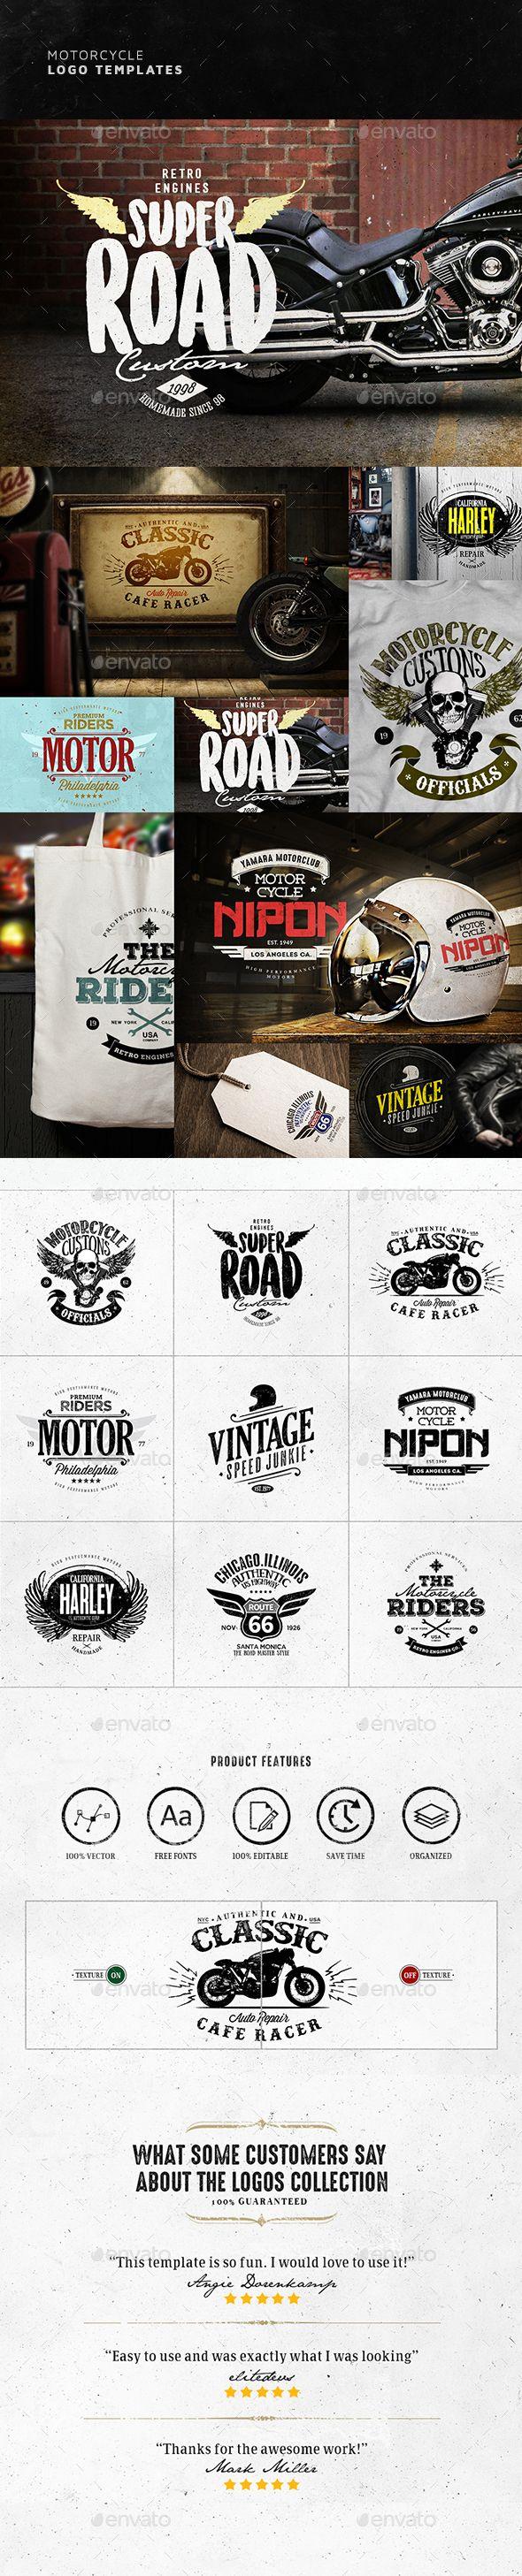 Vintage Motorcycle Logo Design | Photoshop